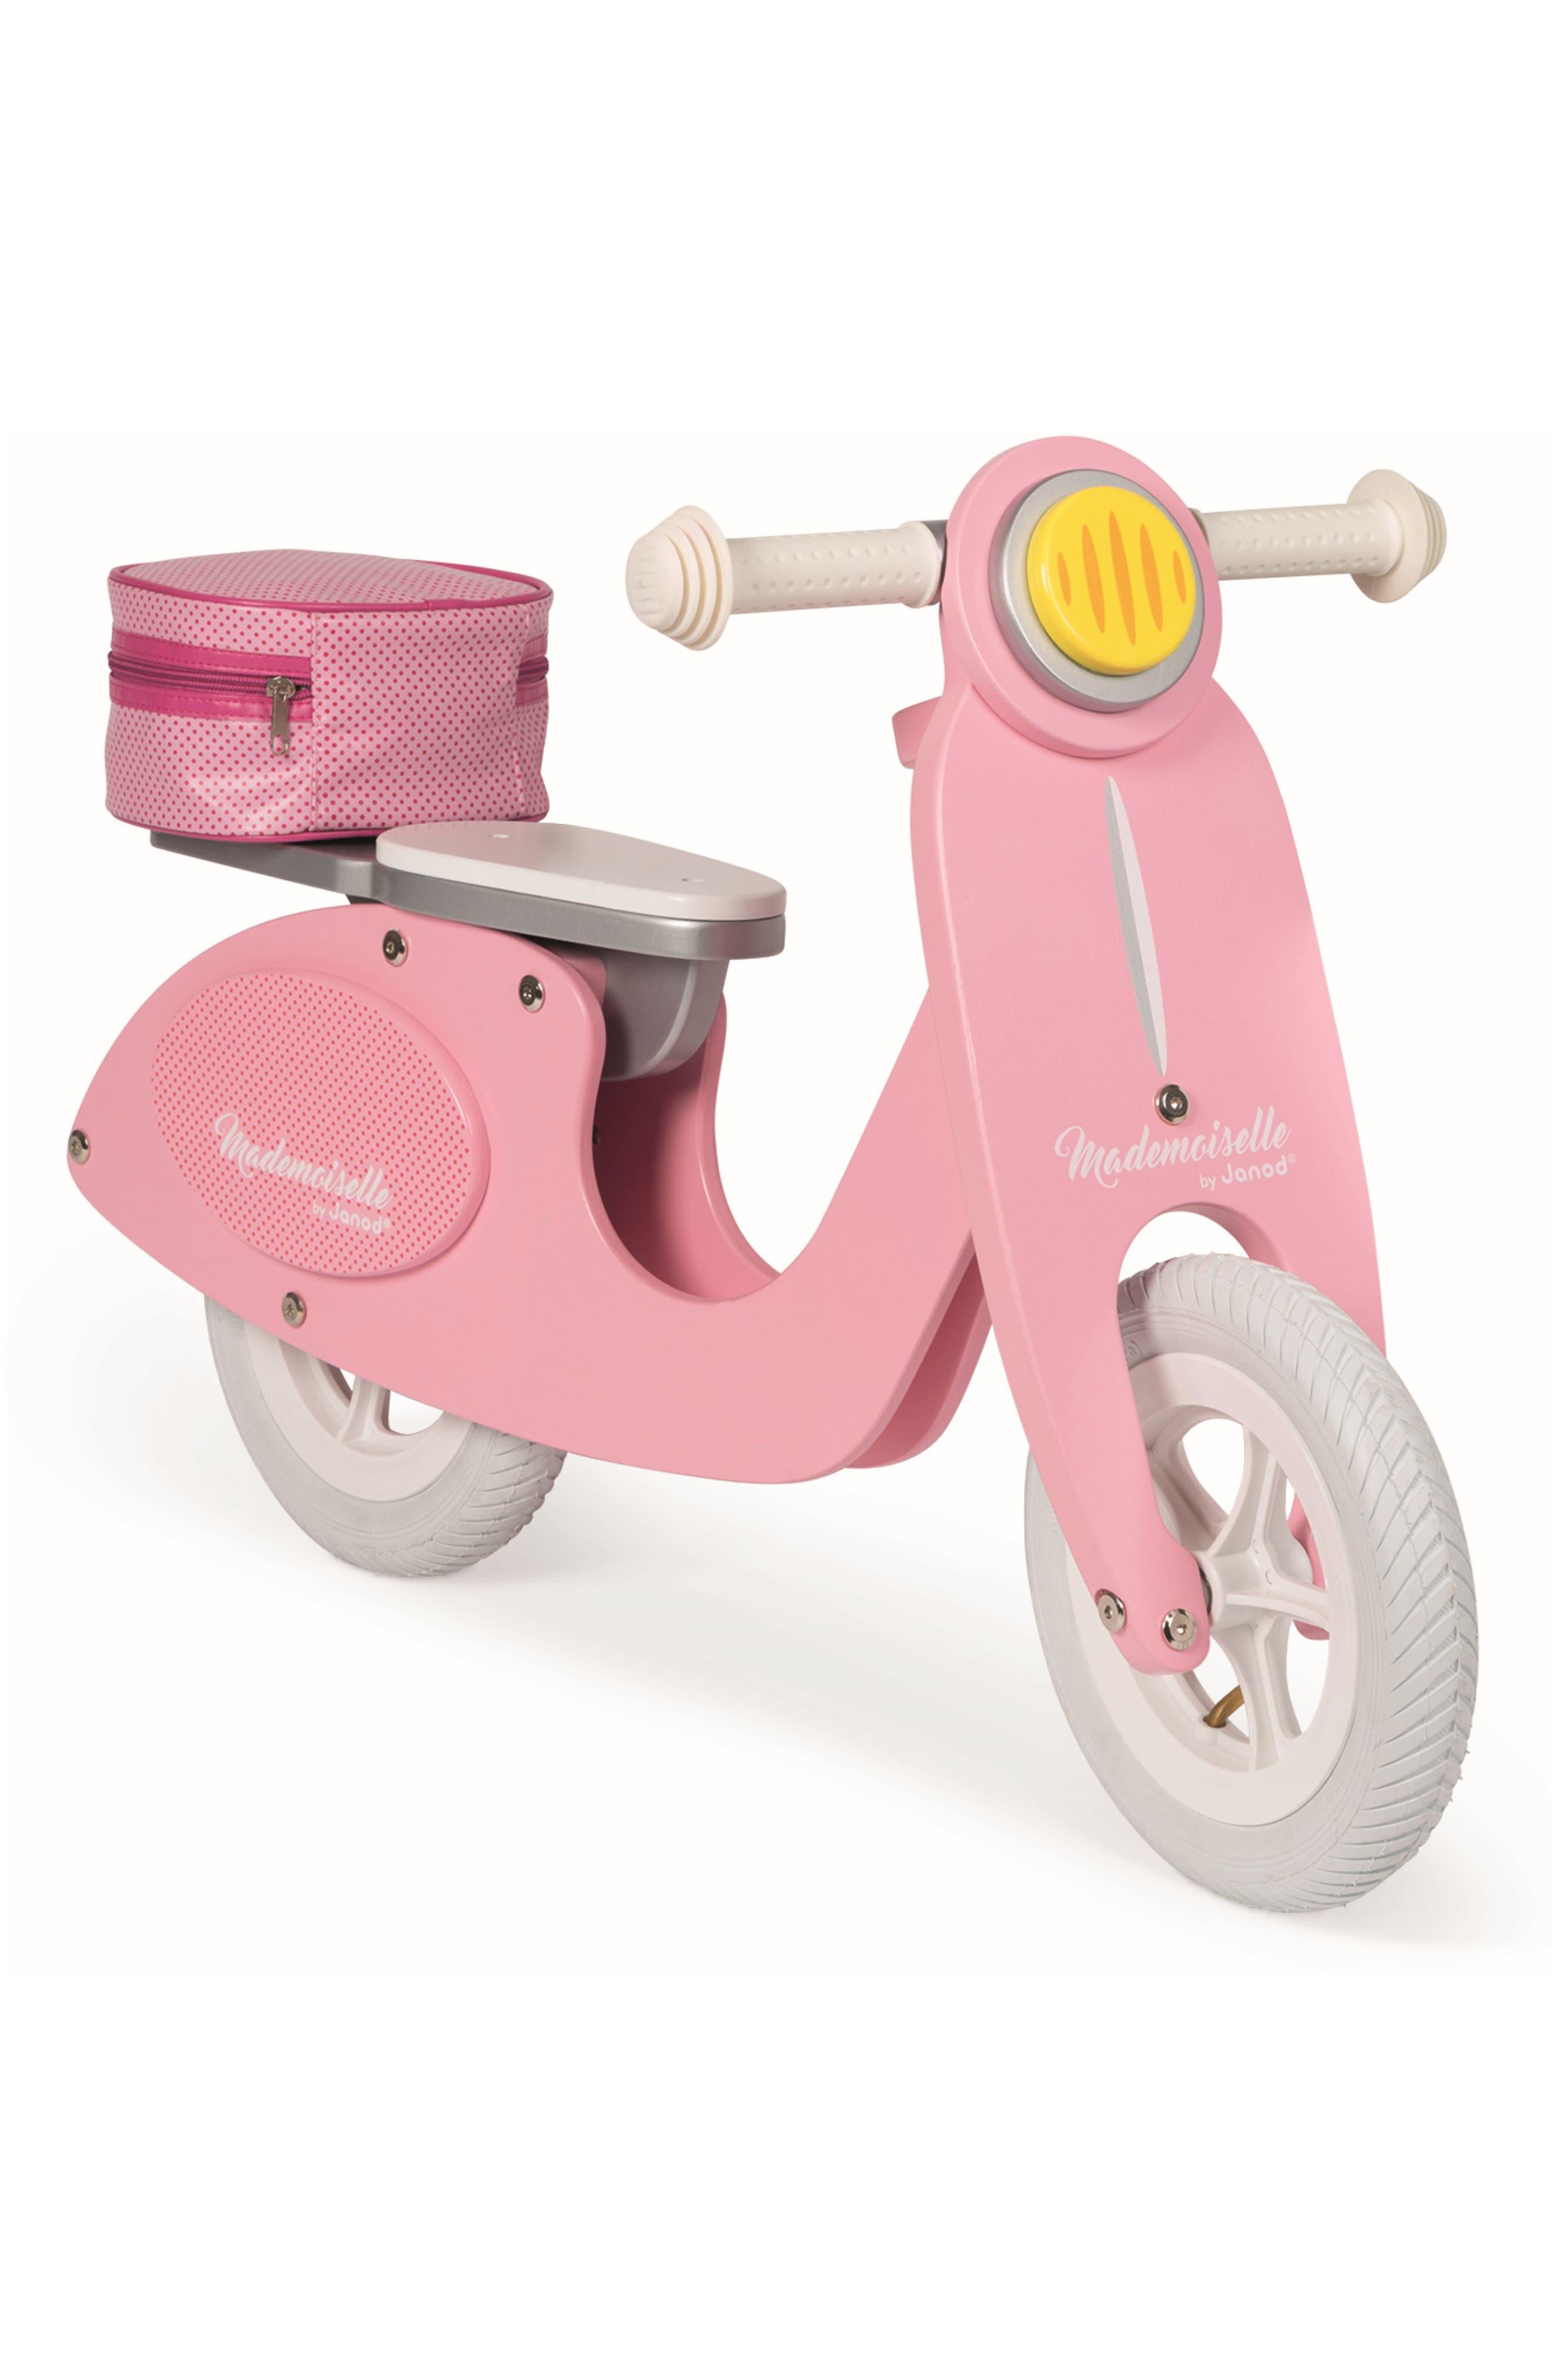 Janod Toddler Girl's Janod Mademoiselle Scooter Balance Bike